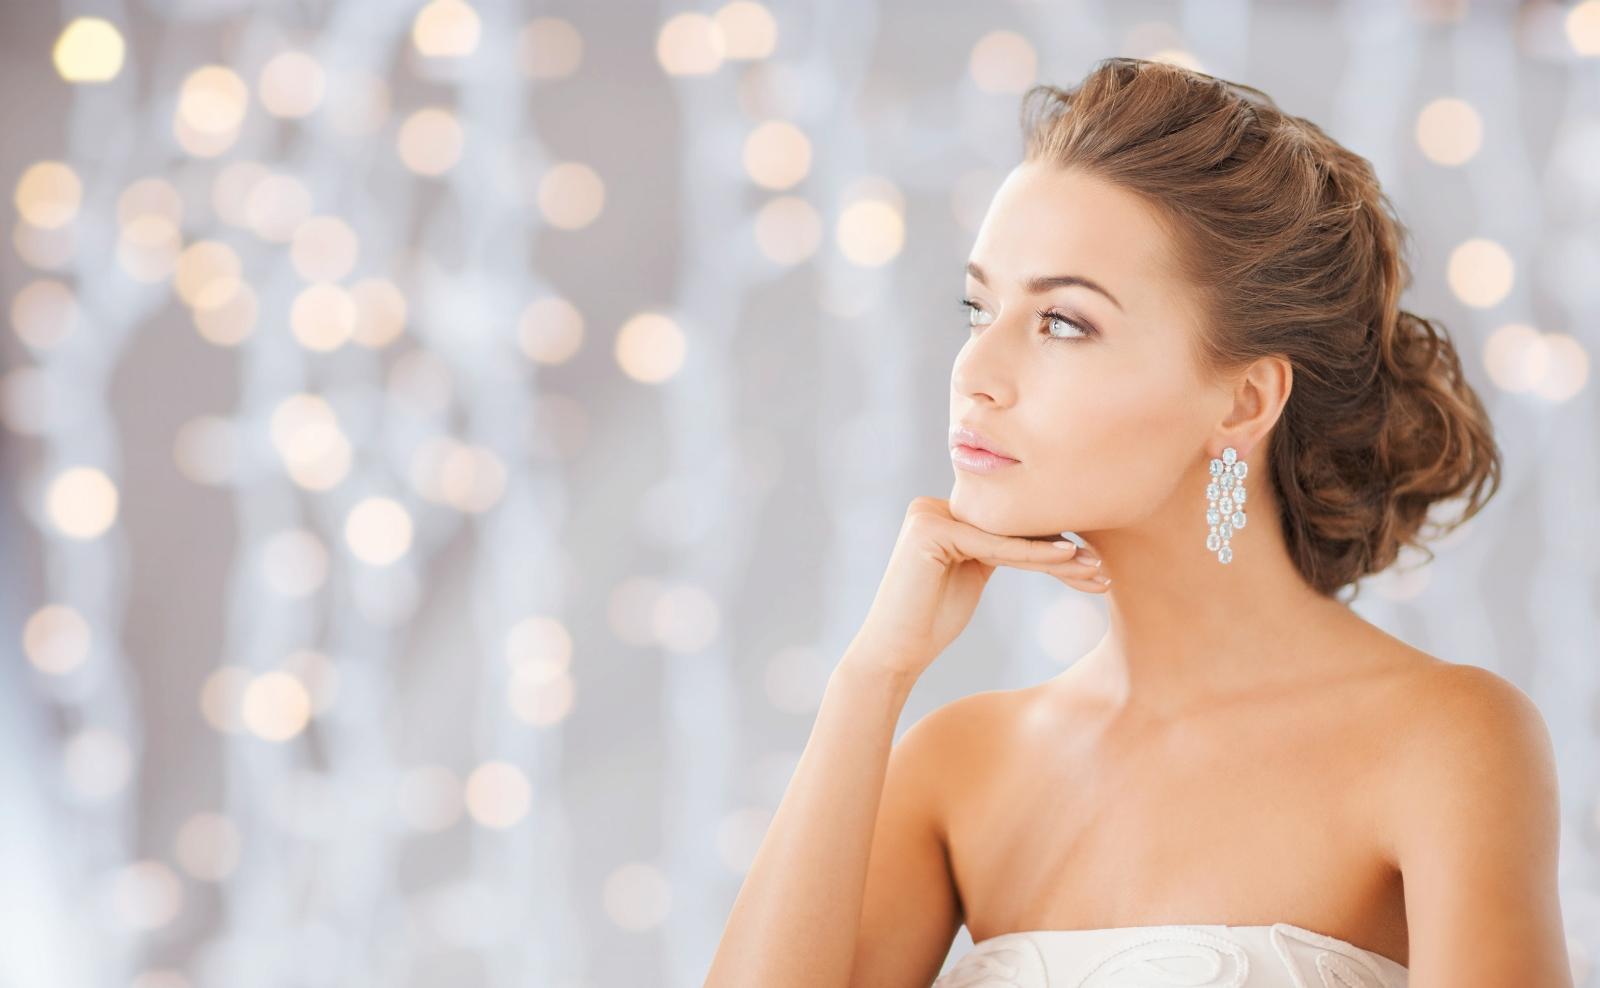 beautiful woman wearing shiny diamond earrings